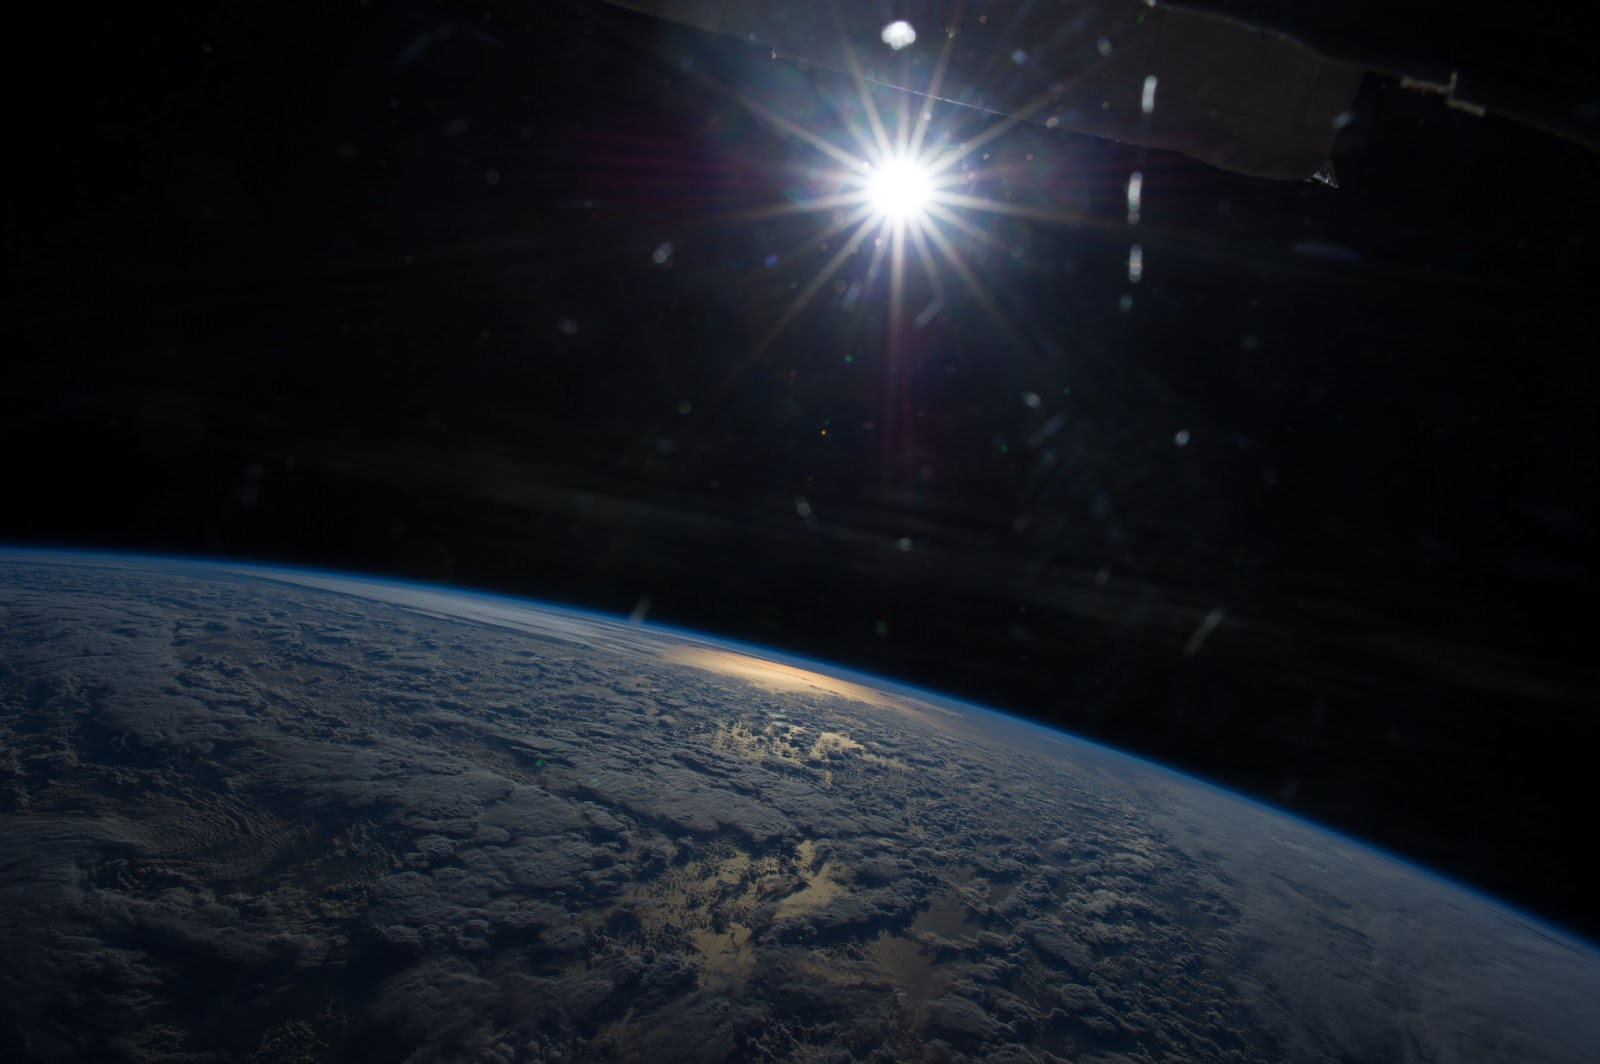 yosemite international space station - photo #20